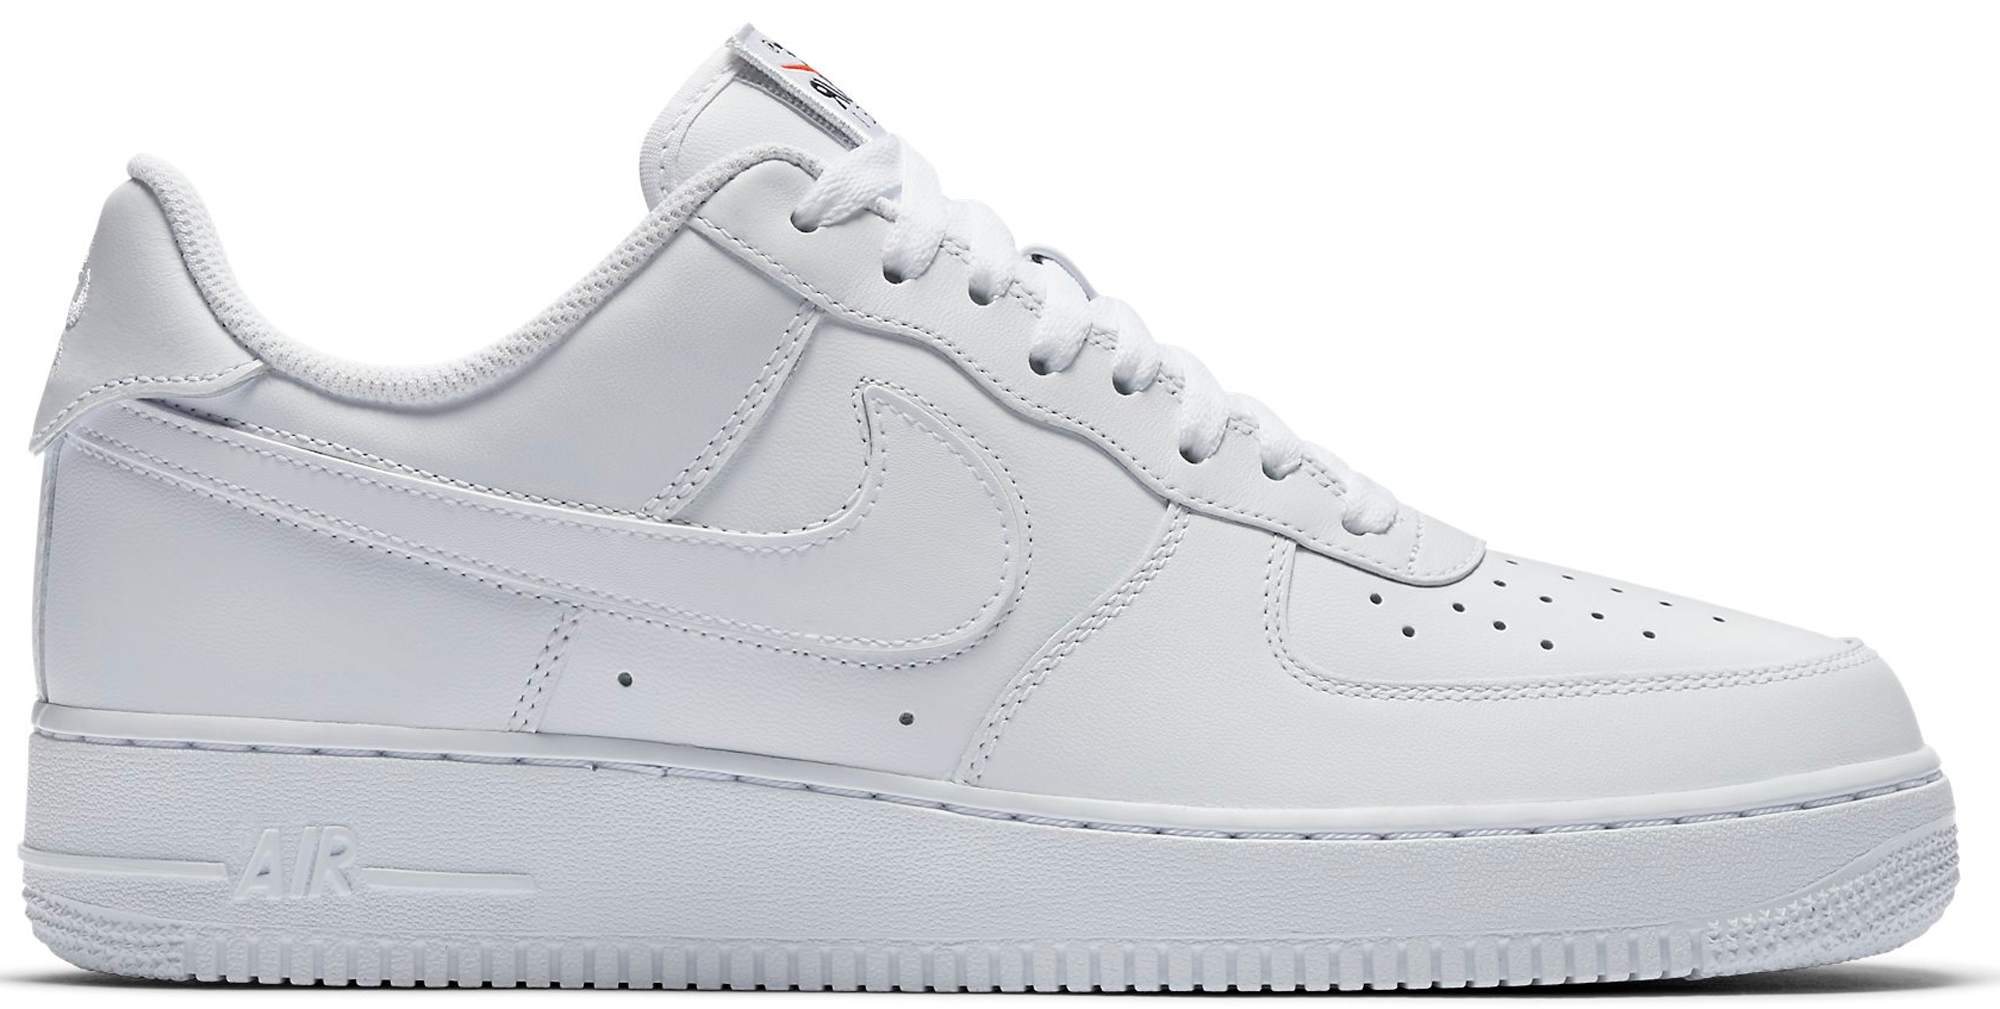 e97cca8d53c1a0 Cheap Air Nike Jordans